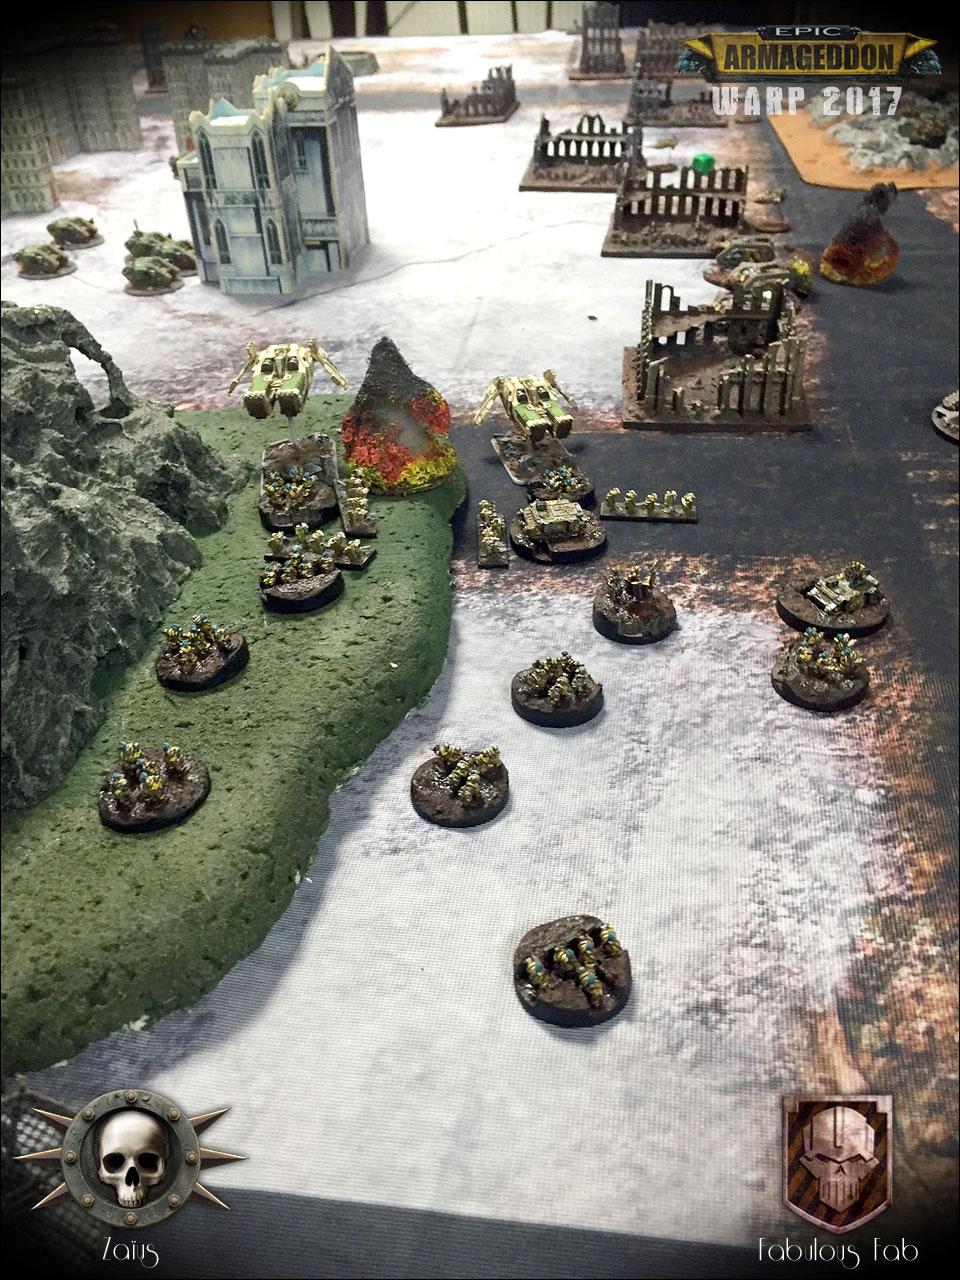 [2017][EA][Blain] WARP - DEBRIEFING ! - Page 2 Megageddon-Tour-2-e